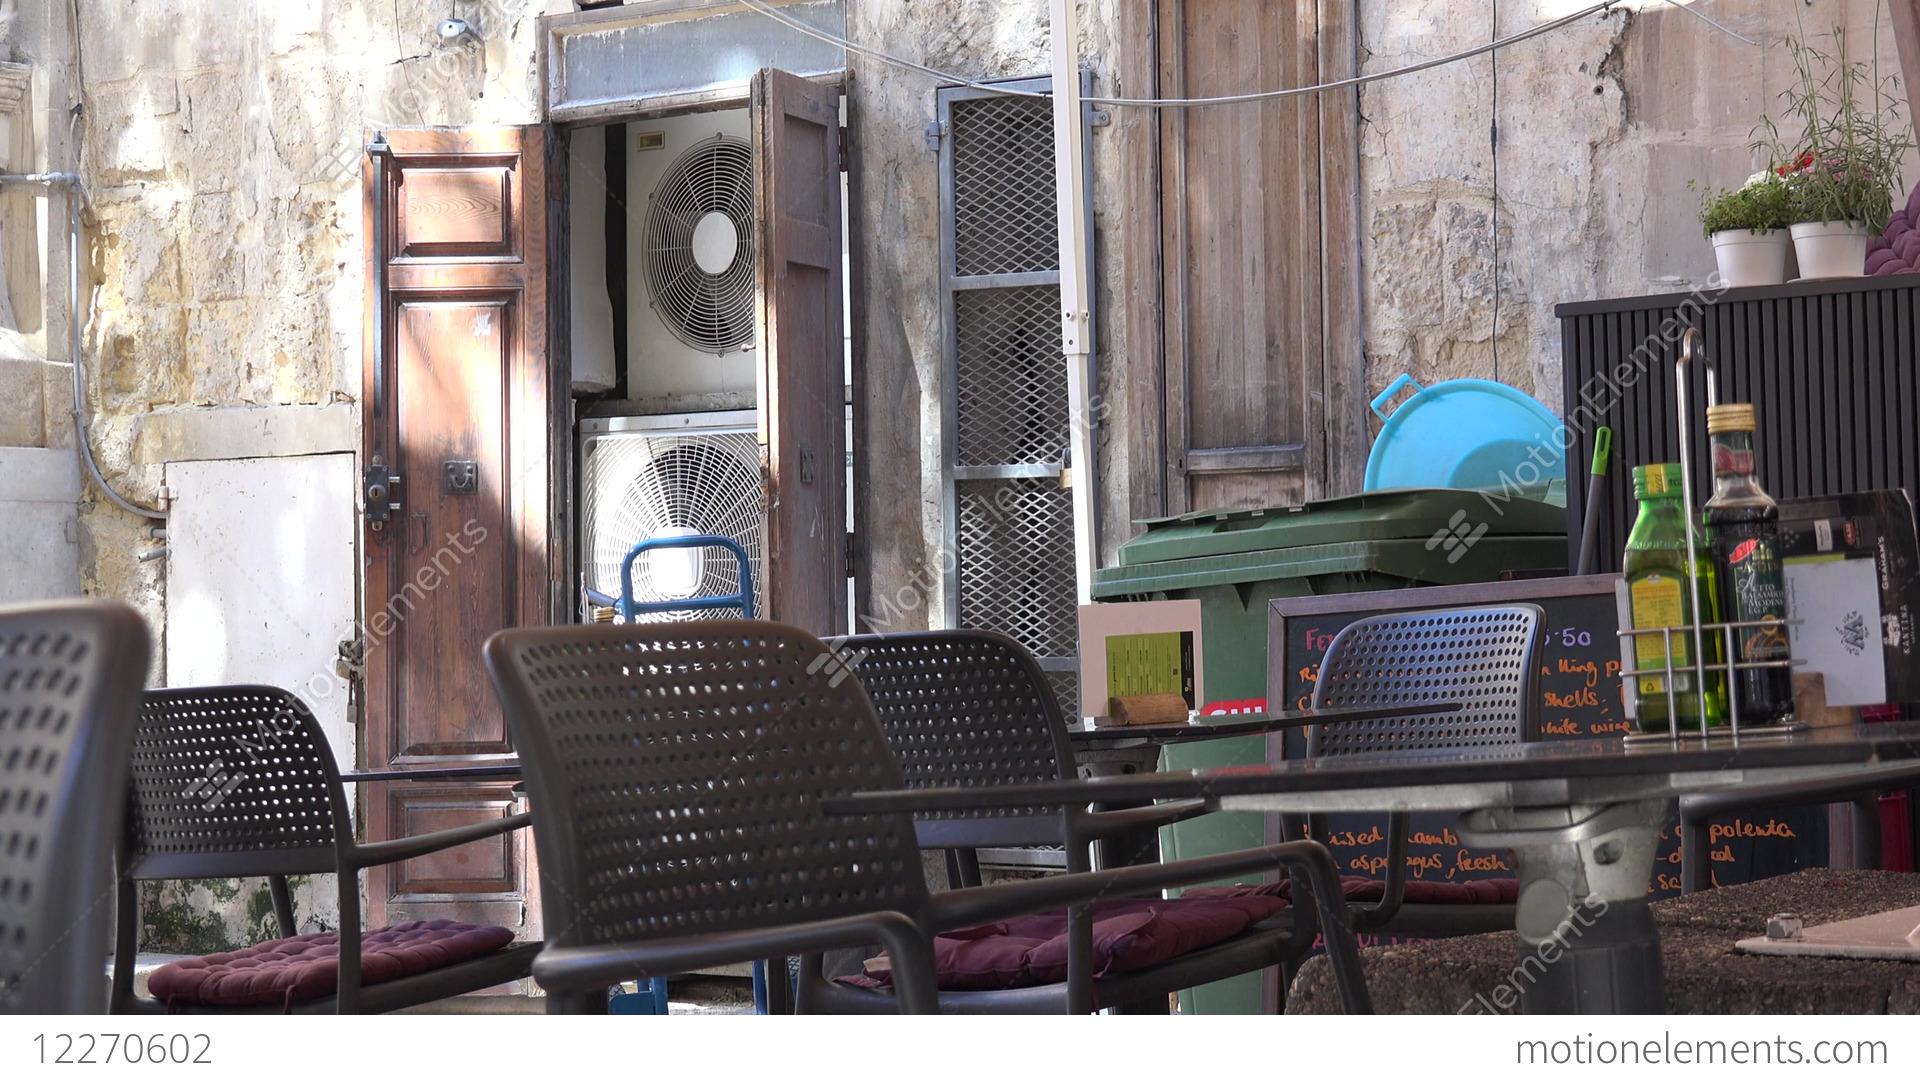 Malta valletta sitting furniture and air condition of